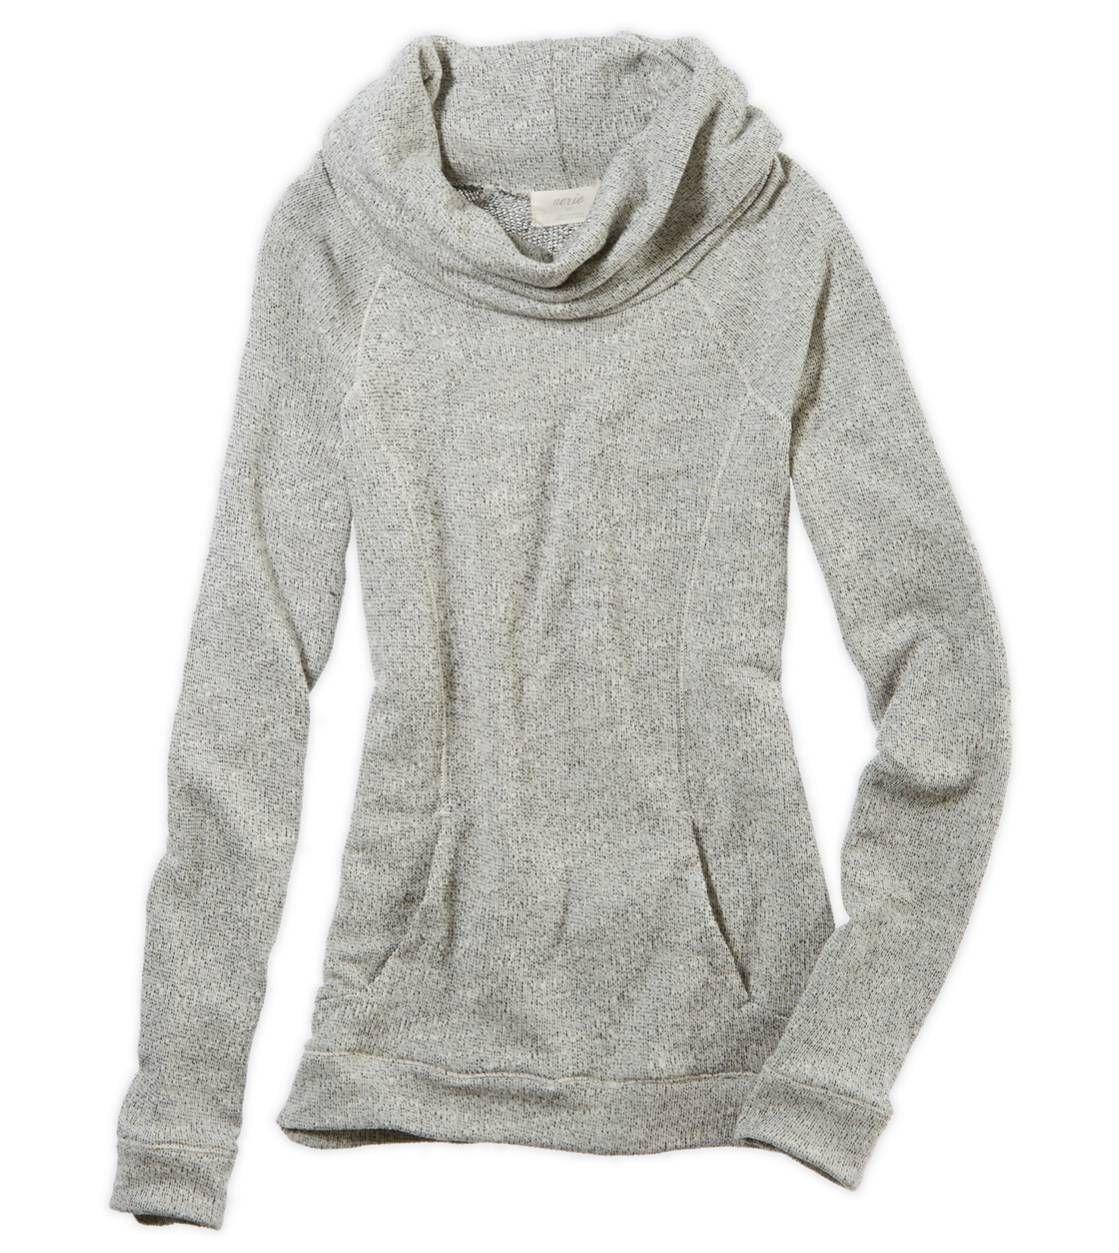 Aerie Cowl Neck Sweatshirt | My Style | Pinterest | Heather grey ...